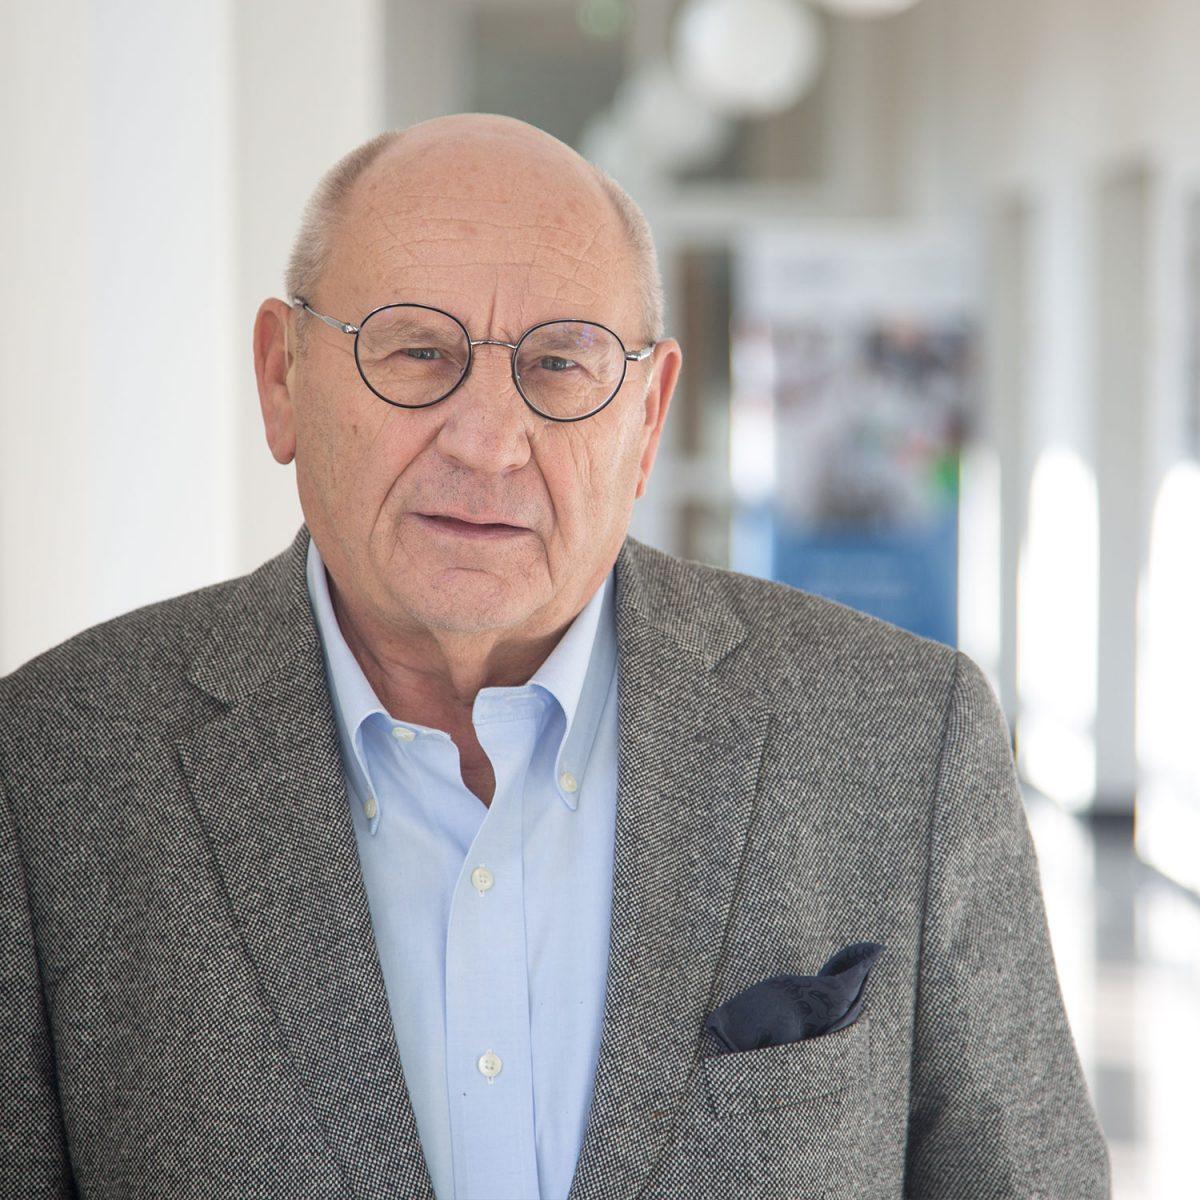 Prof. Dr. Claus Rueger